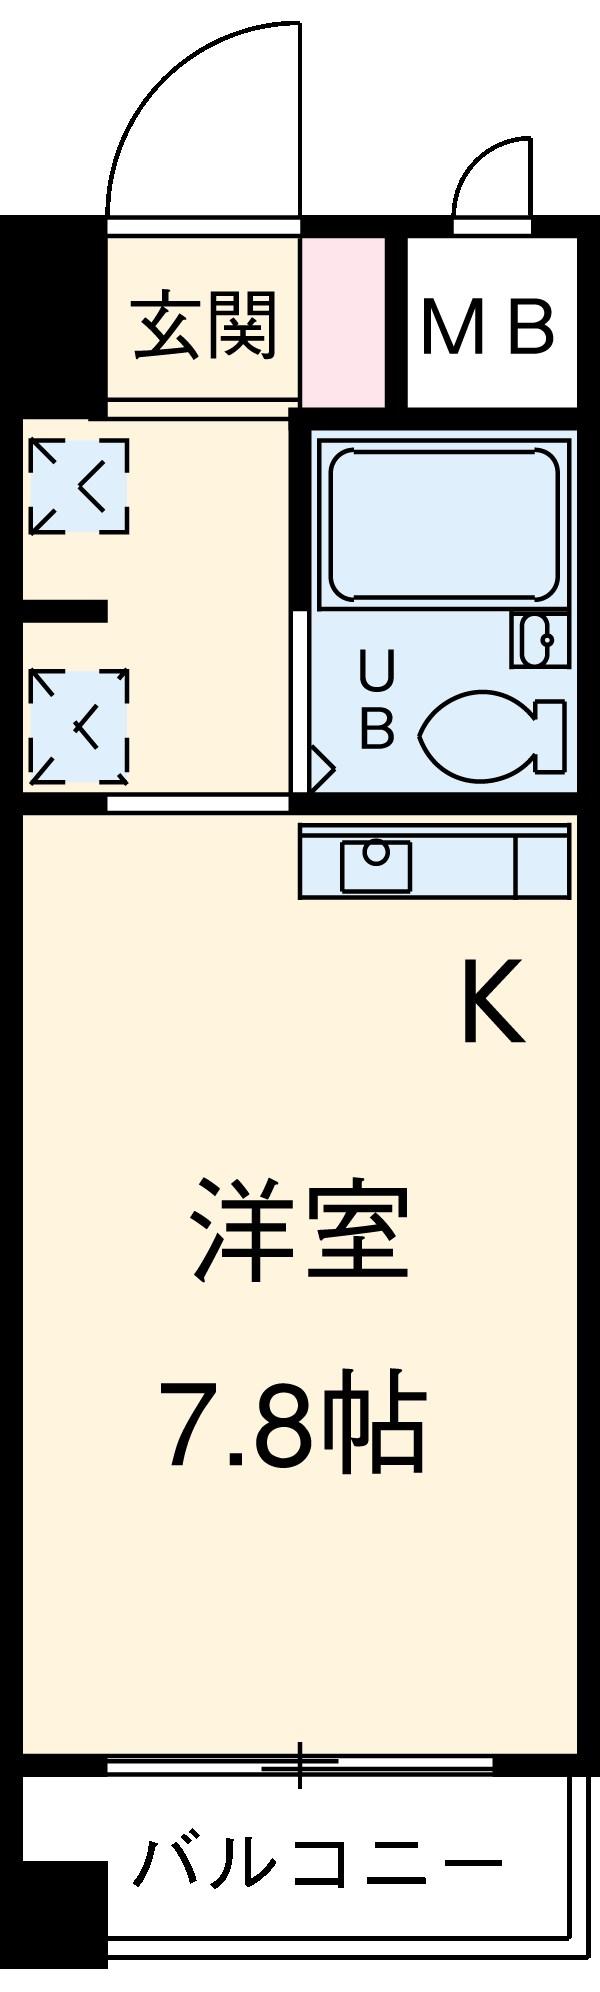 Komodokasa Miwa 601号室の間取り